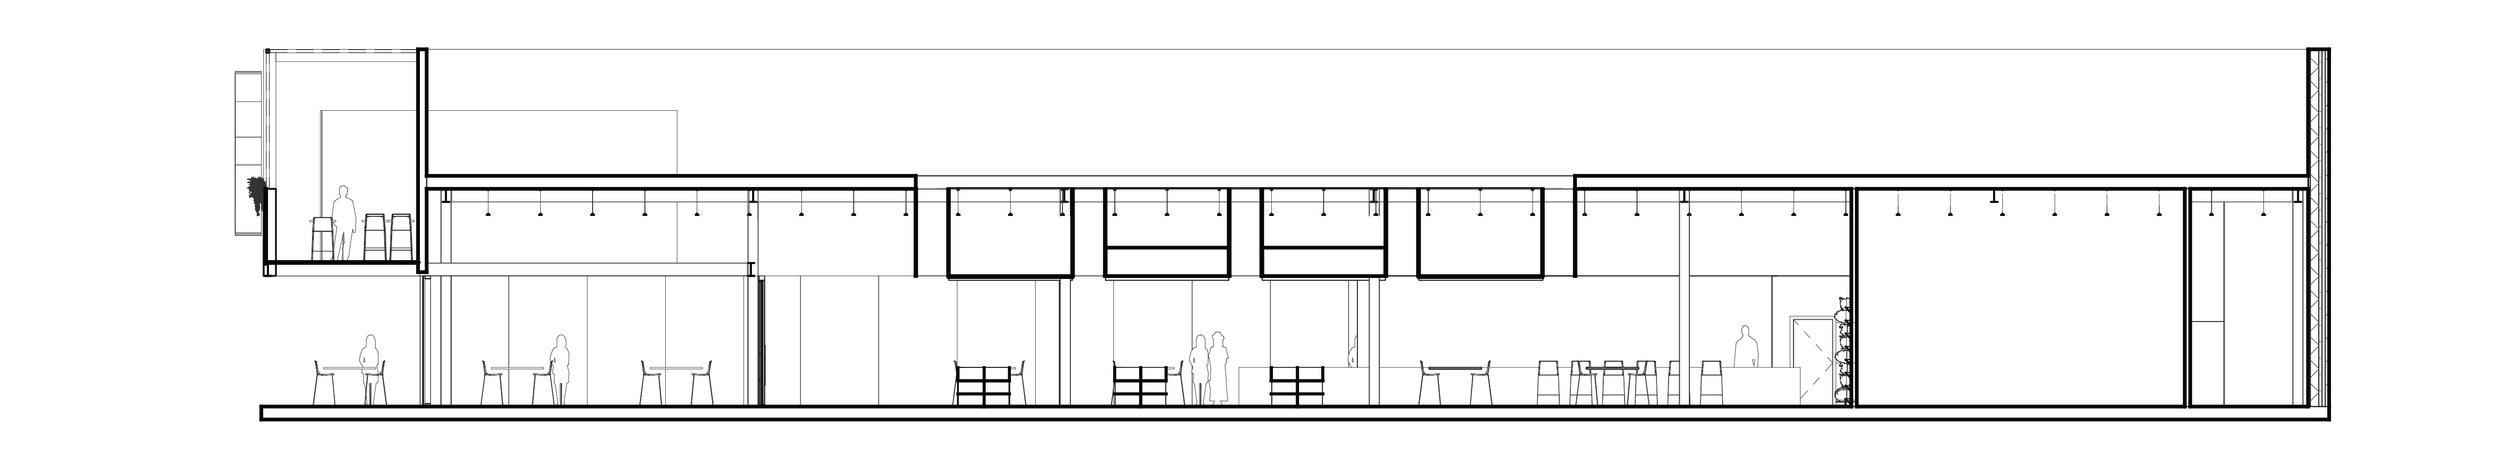 section-01.jpg